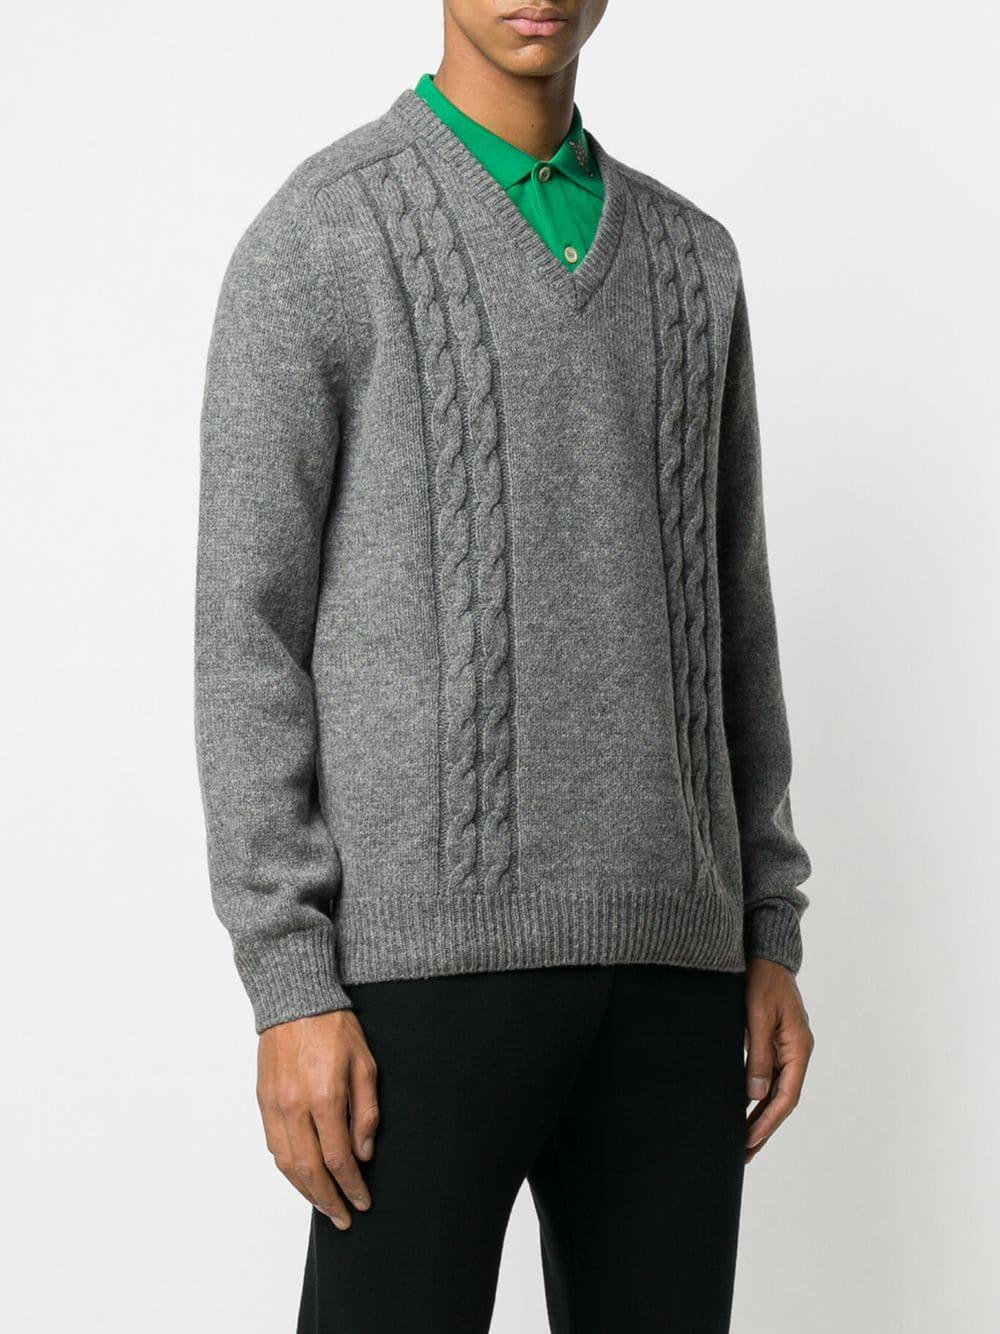 8b6b5fcc5ff4 Gucci - Gray Jacquard Logo Knit Sweater for Men - Lyst. View fullscreen